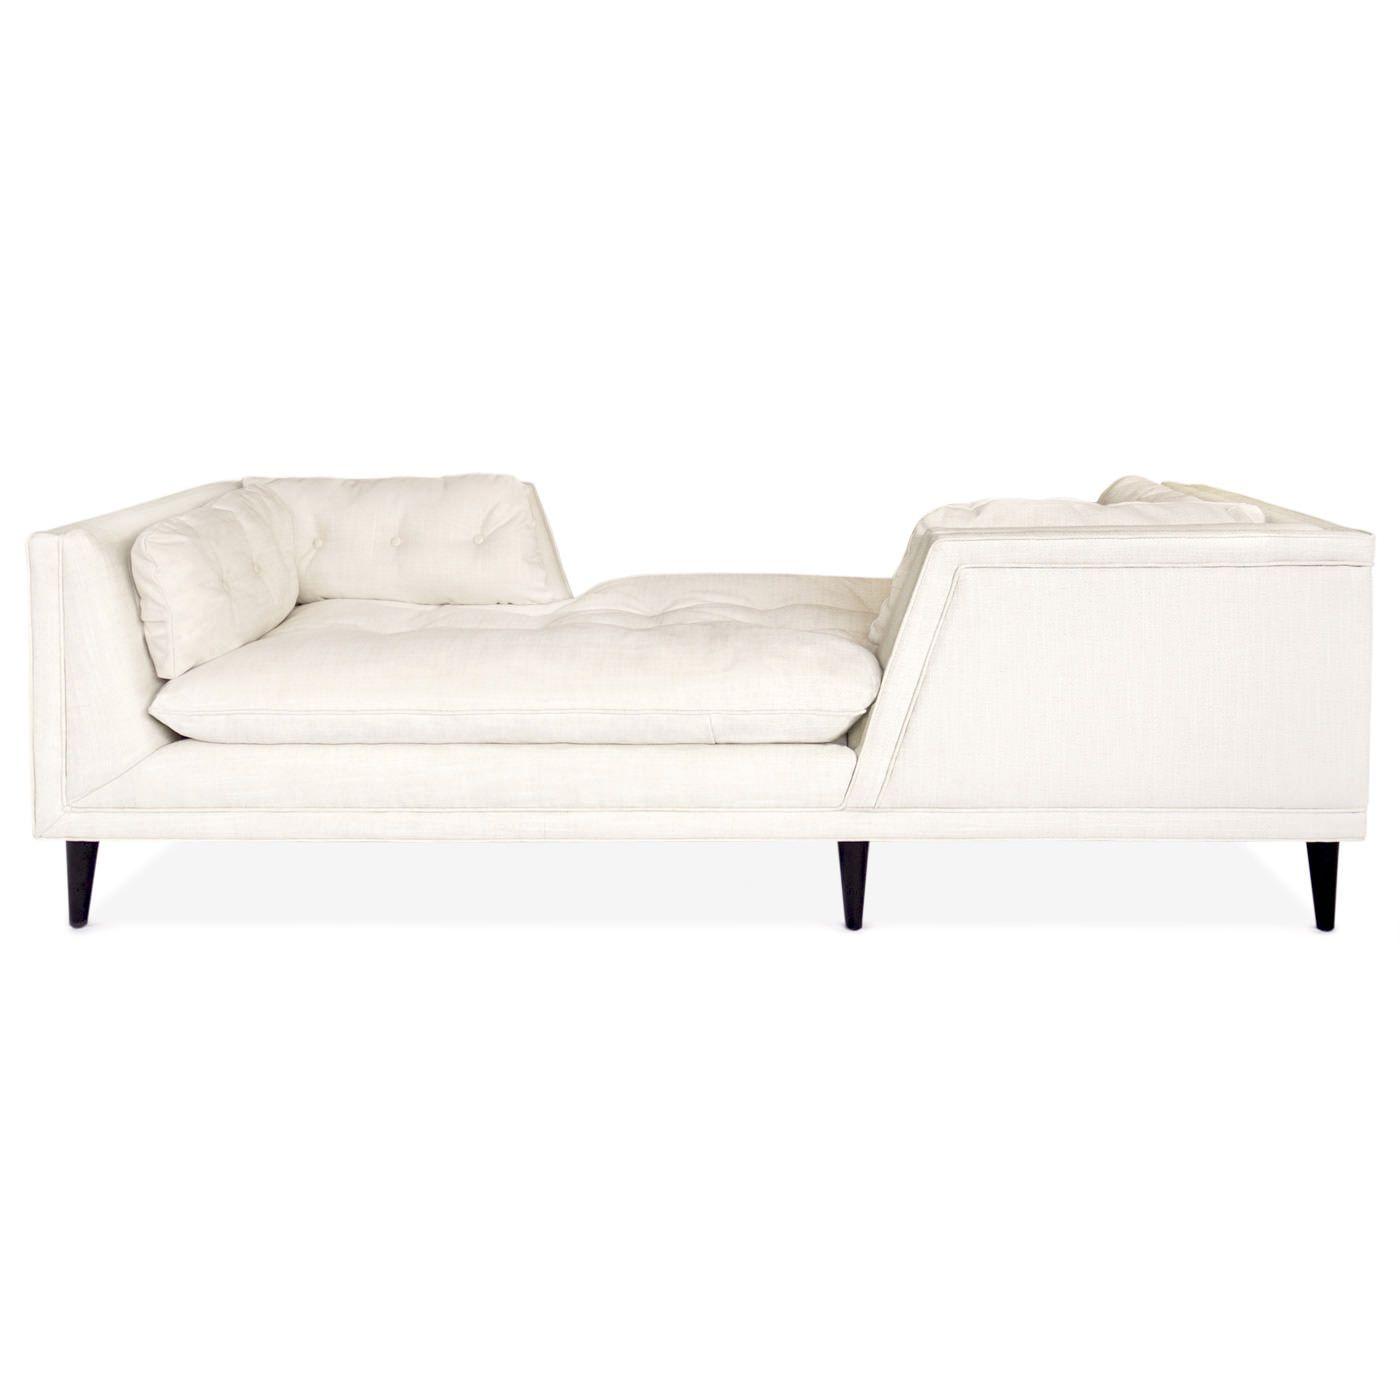 Sofa Table Jonathan Adler Sofas u Sectionals Arden T te T te